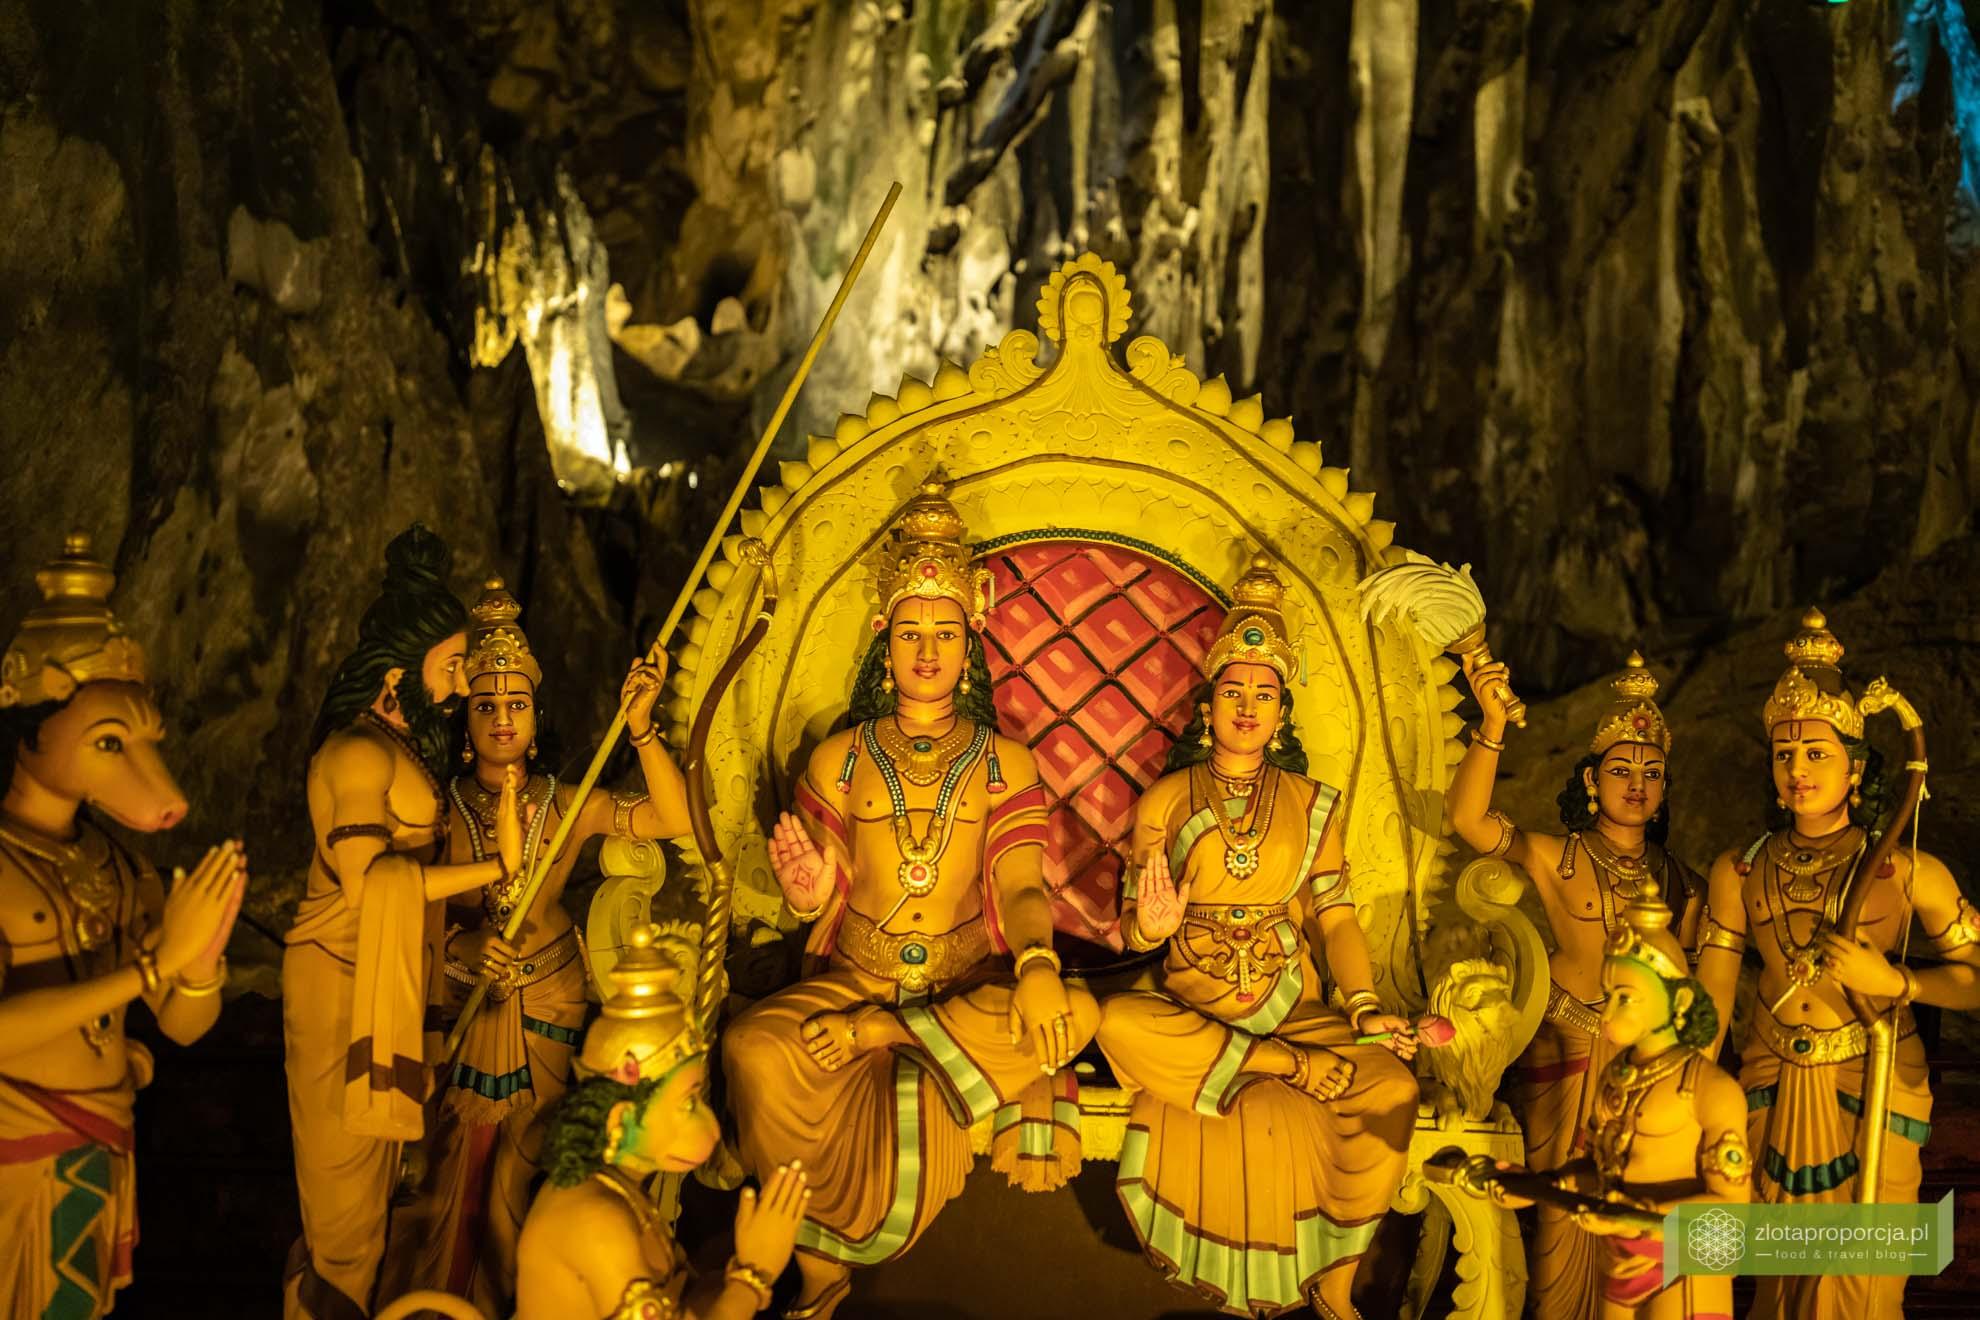 Jaskinie Batu; Batu Caves; Kuala Lumpur; atrakcje Kuala Lumpur; Malezja; Ramayana Cave; jaskinia Ramayana; jaskinie Kuala Lumpur;